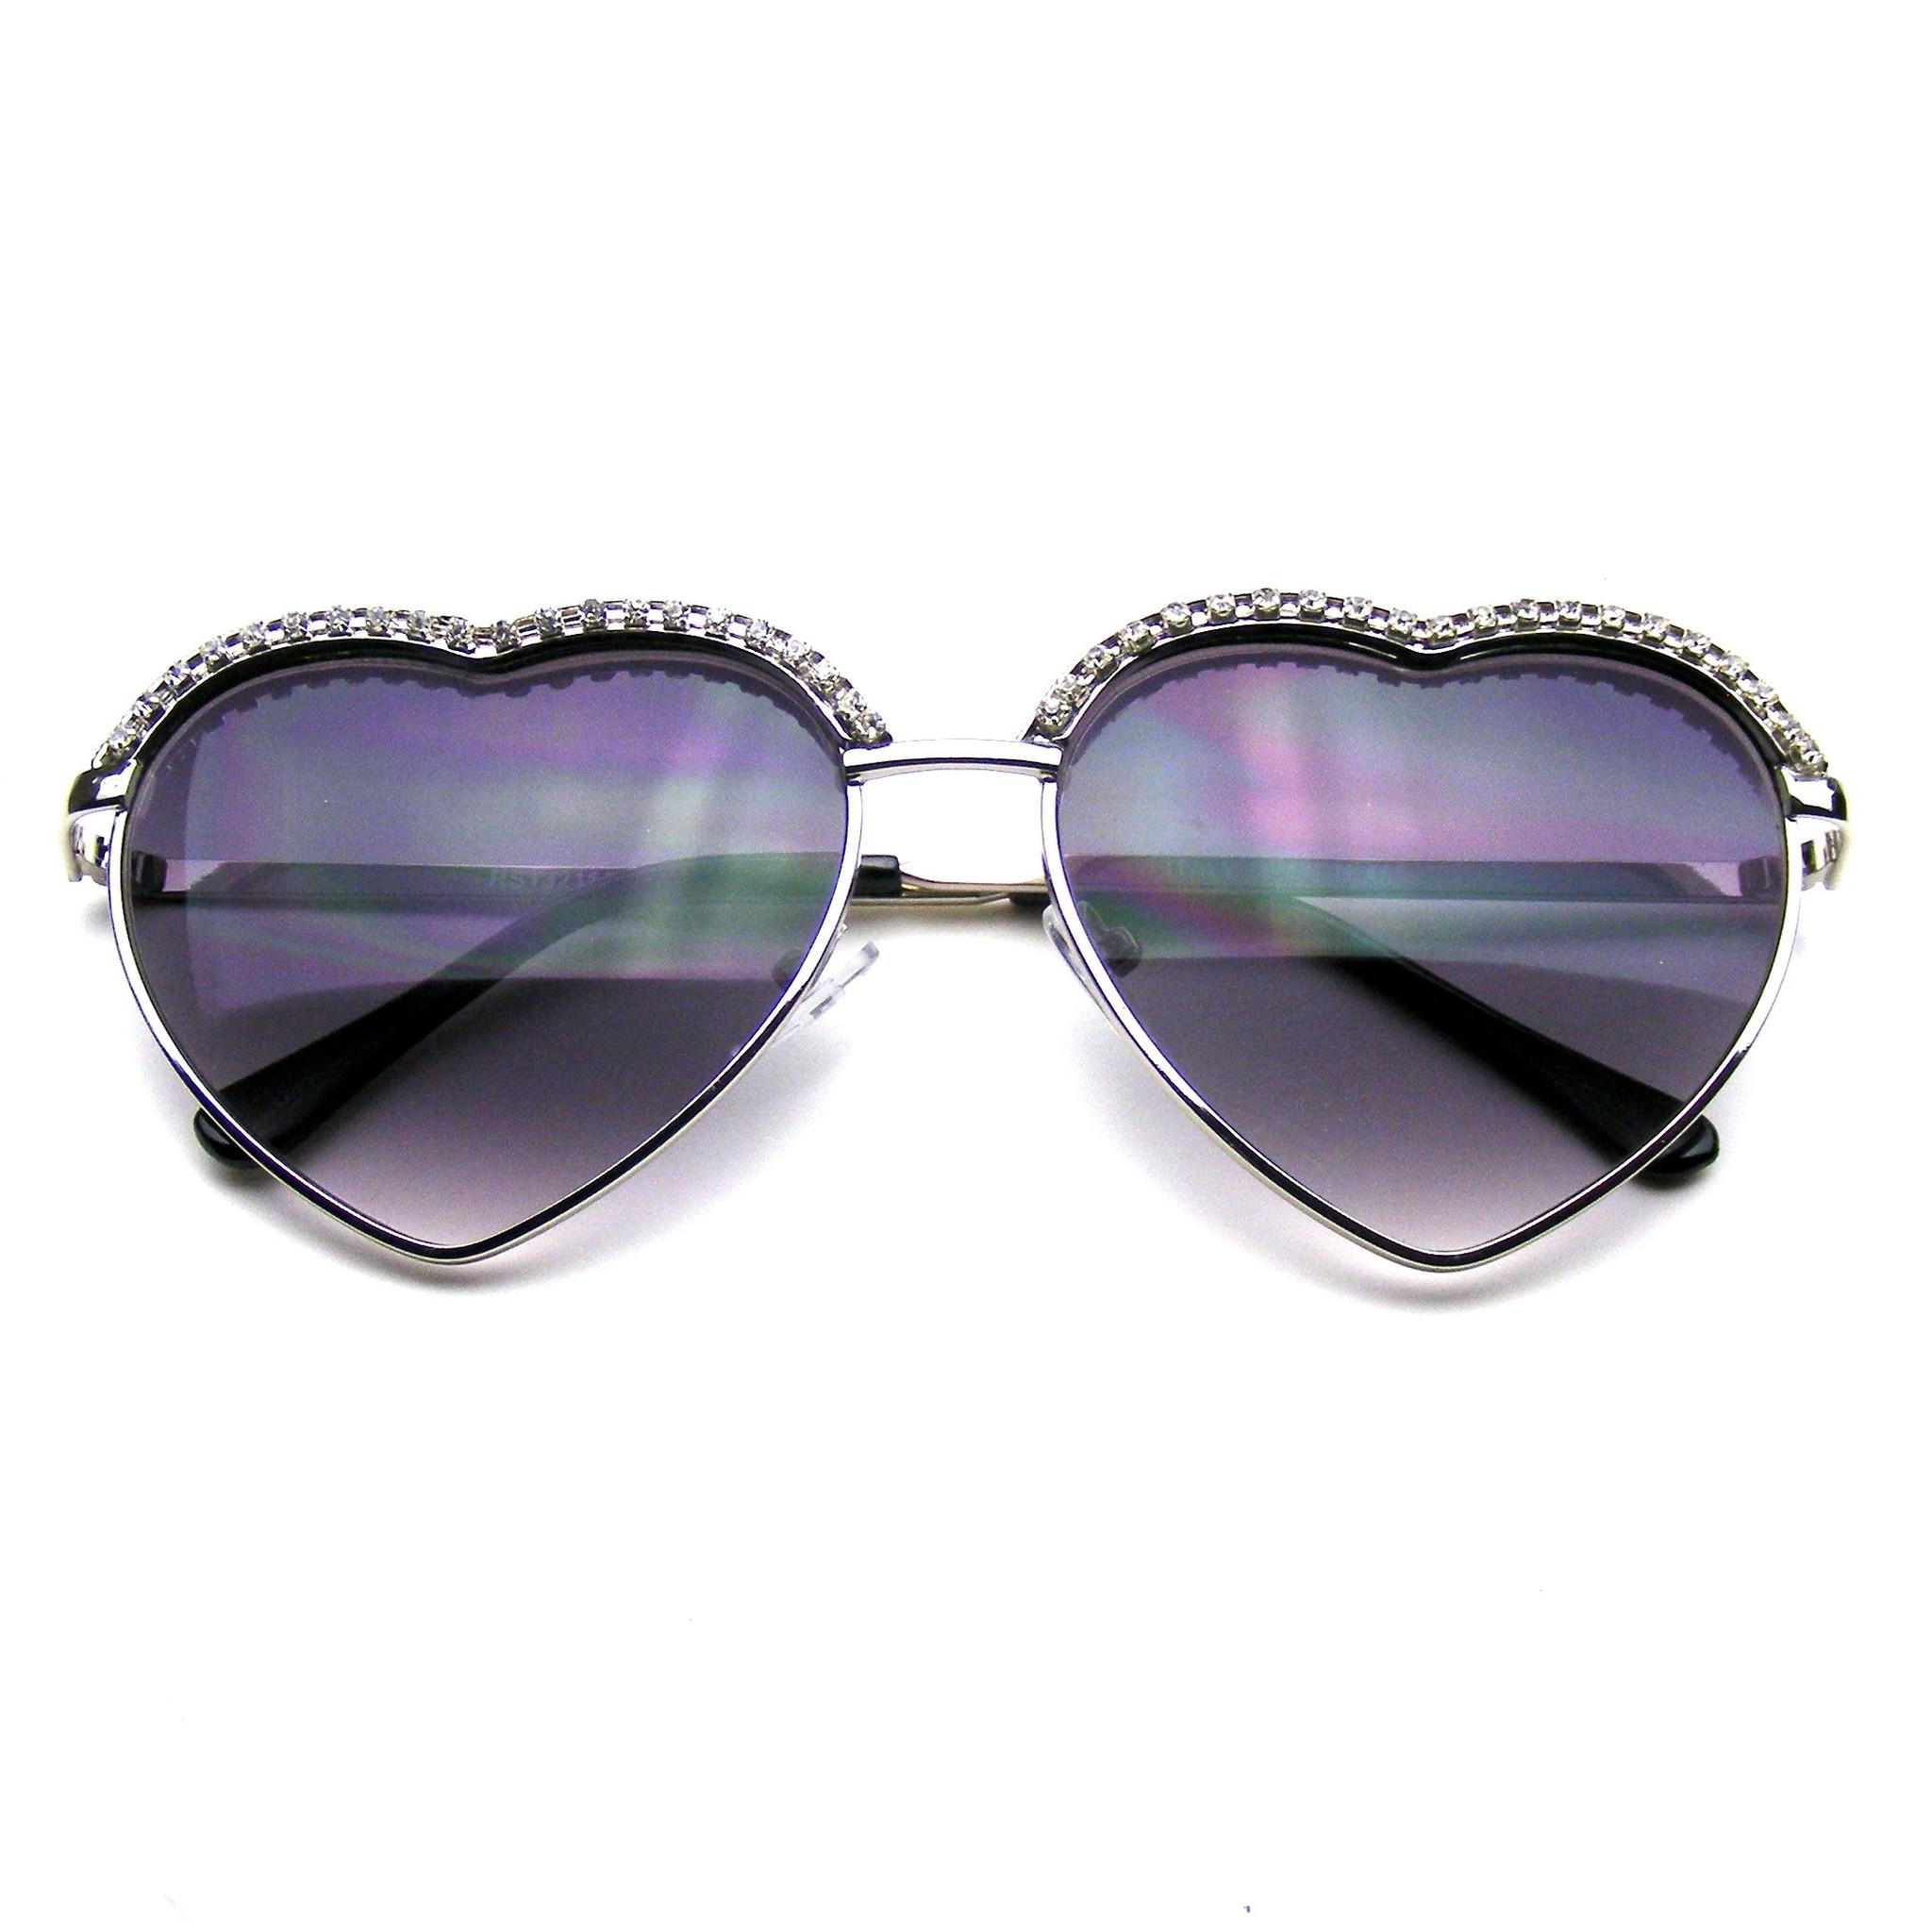 Cute Chic Heart Shape Glam Rhinestone Sunglasses · Emblem ... - photo#29